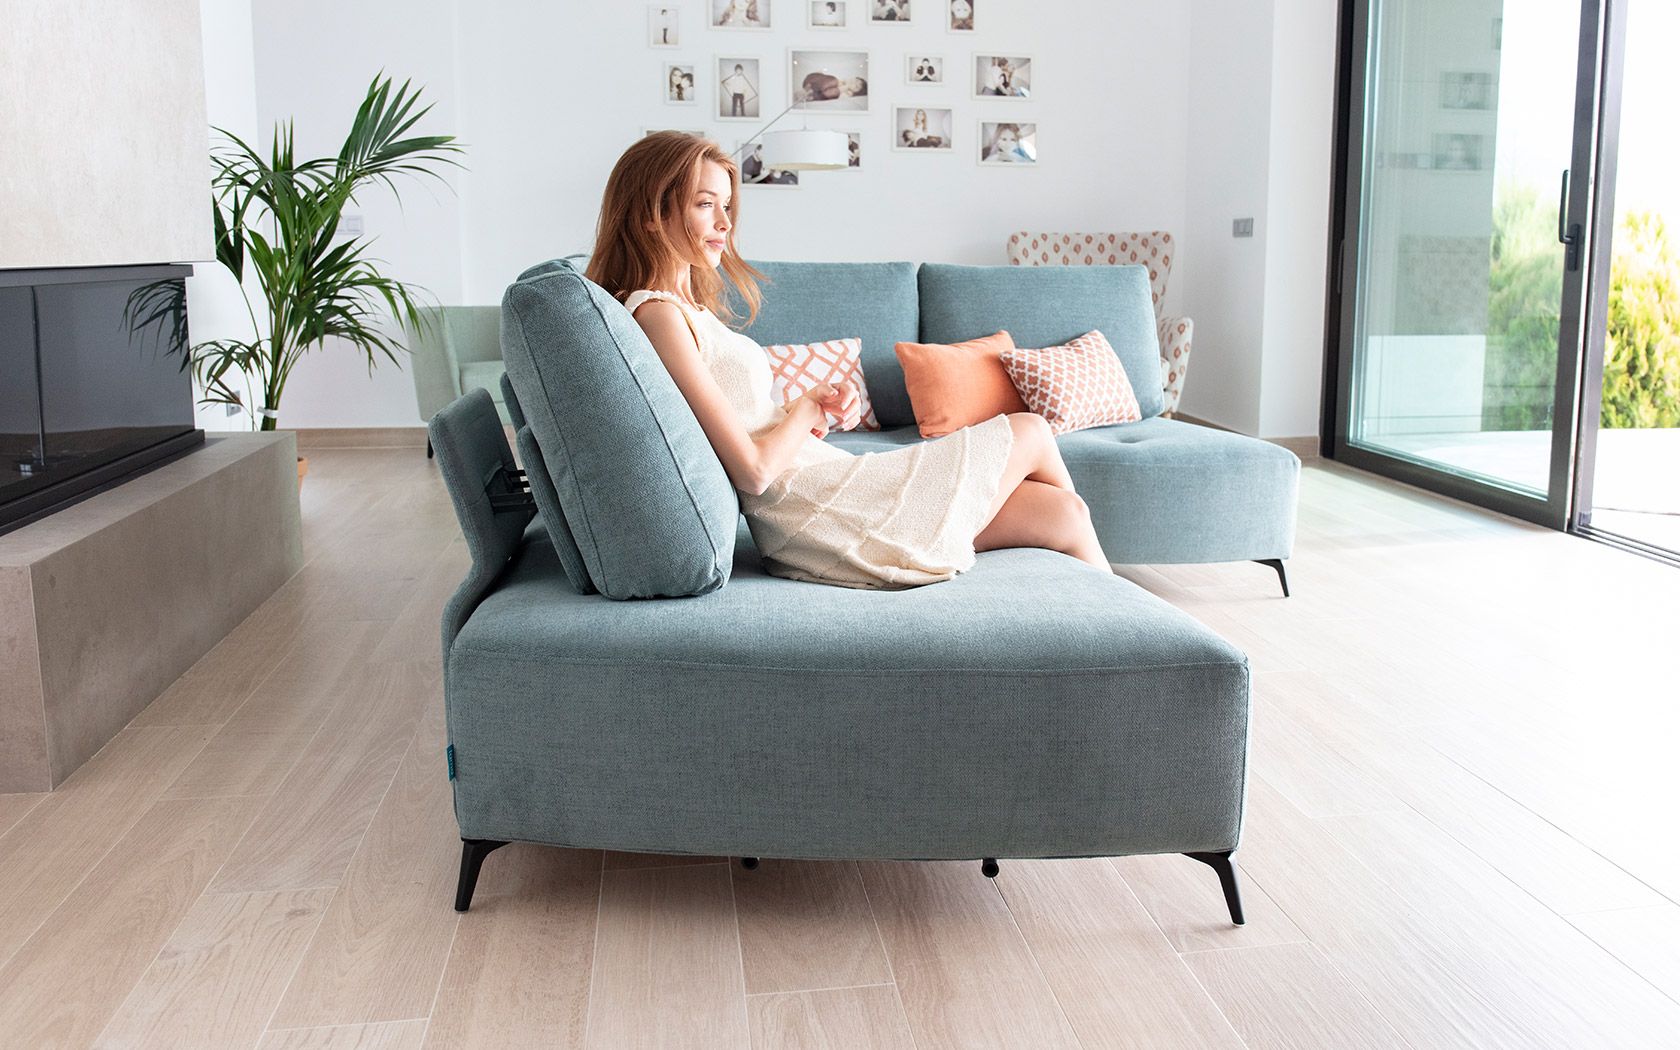 kalahari sofa 2021 18